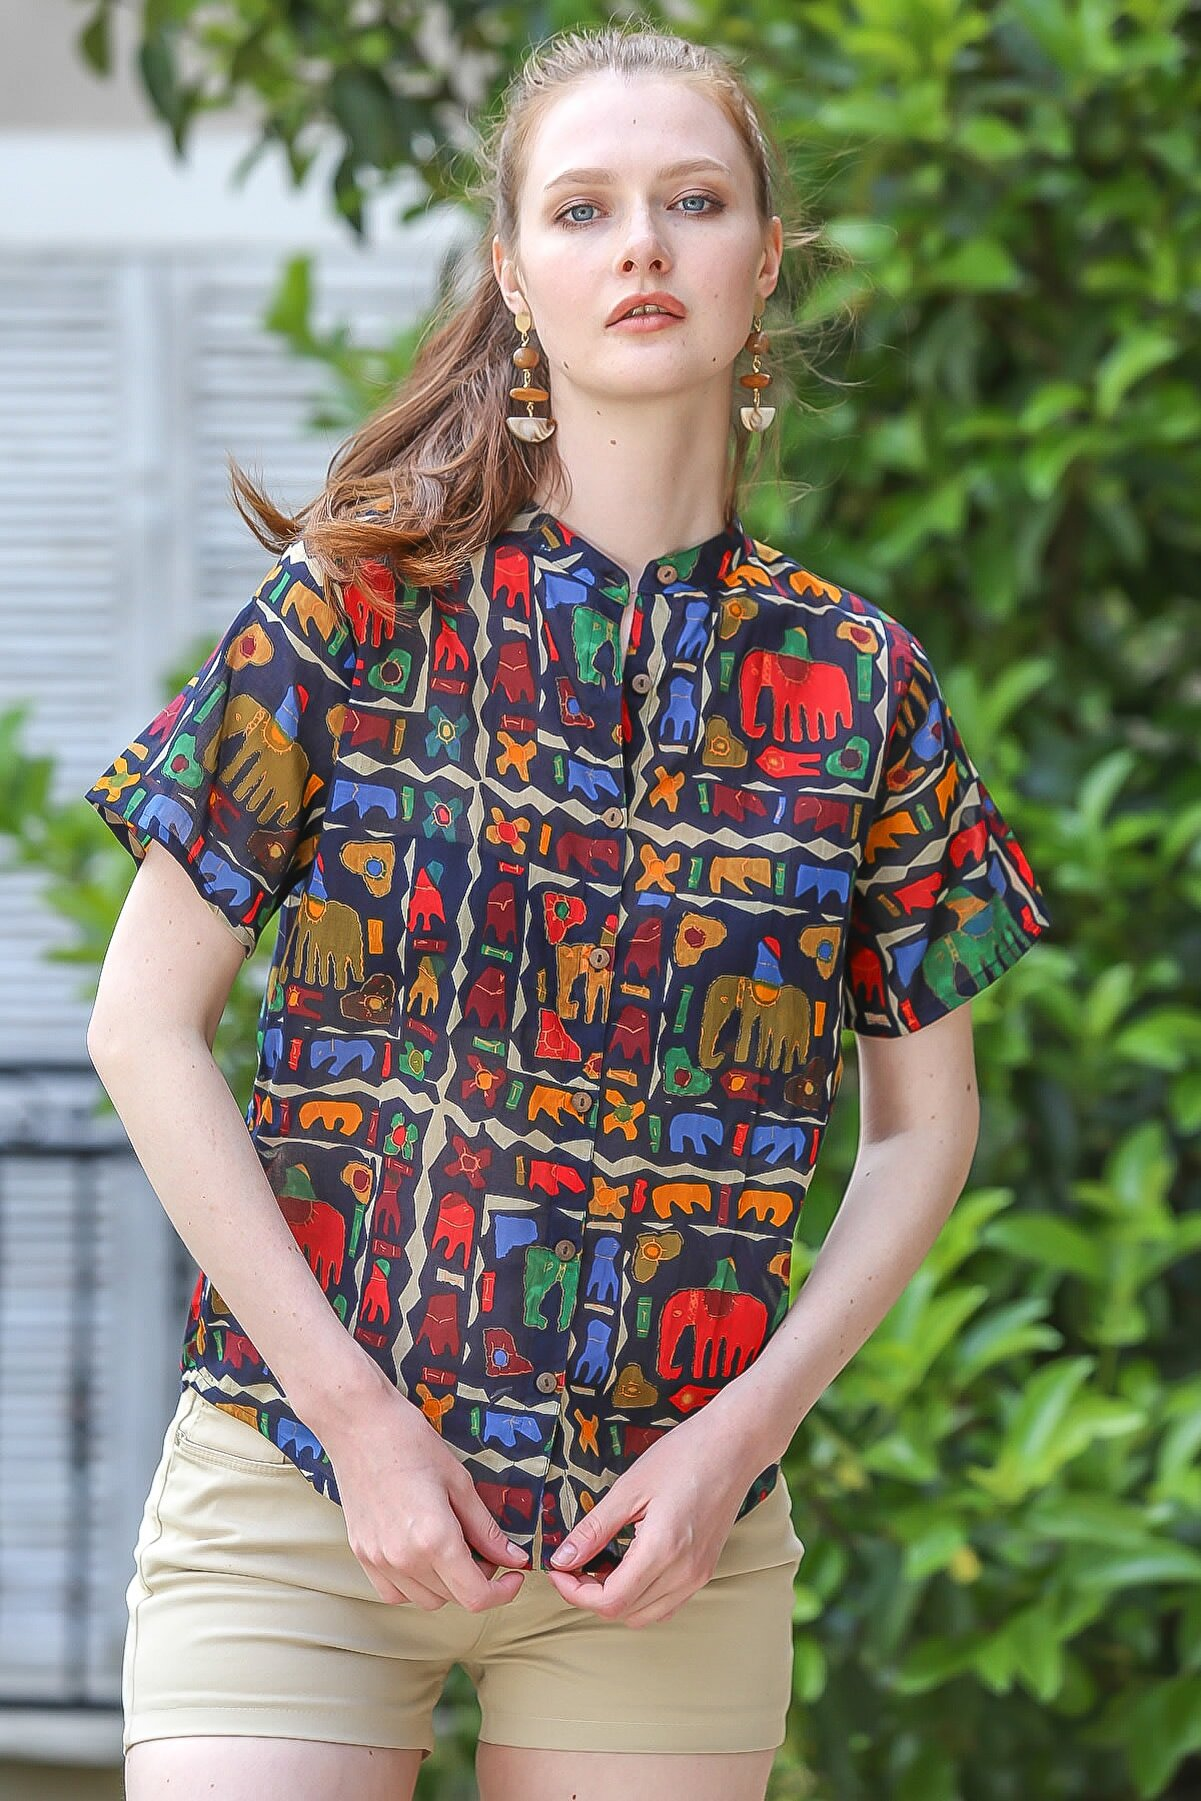 Chiccy Kadın Lacivert Yakasız Düğme Detaylı Fil Desenli Dokuma Bluz M10010200BL95376